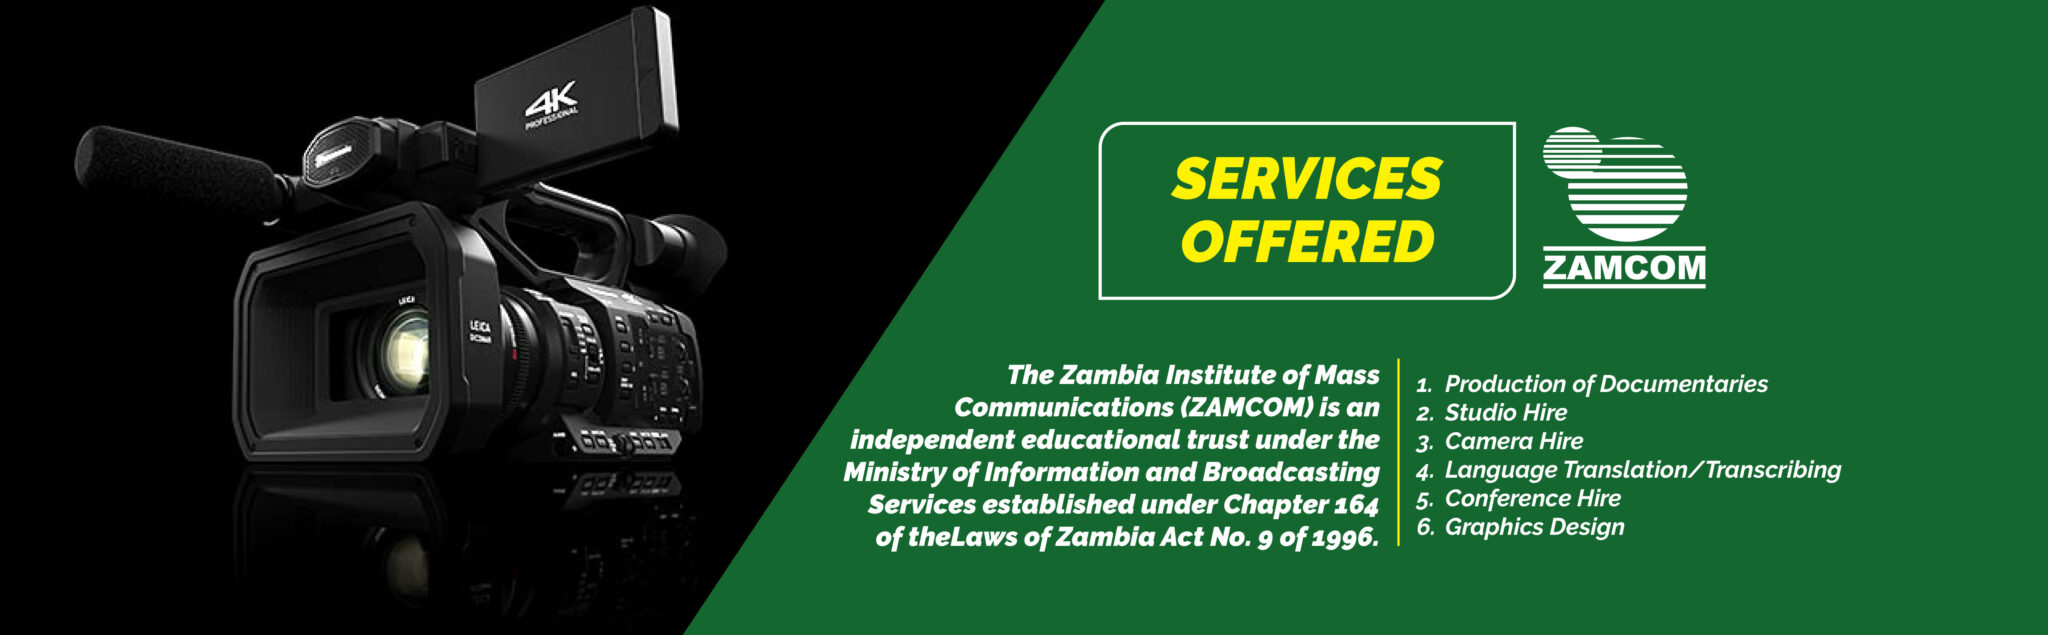 ZAMCOM WEBSITE IMAGES - 1290px x 400px5